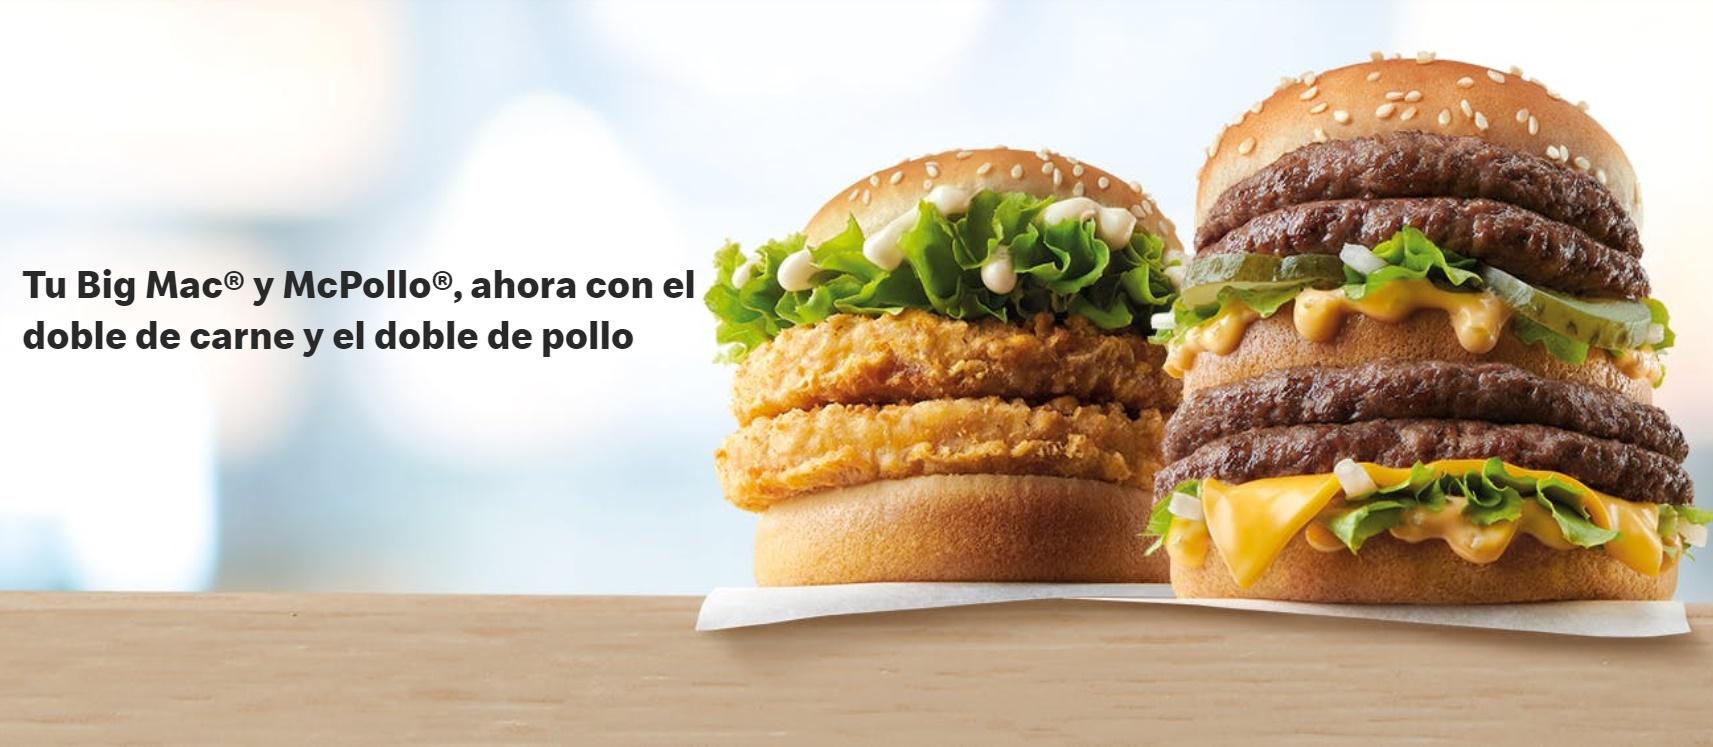 McDonald's Festive Menu 2020